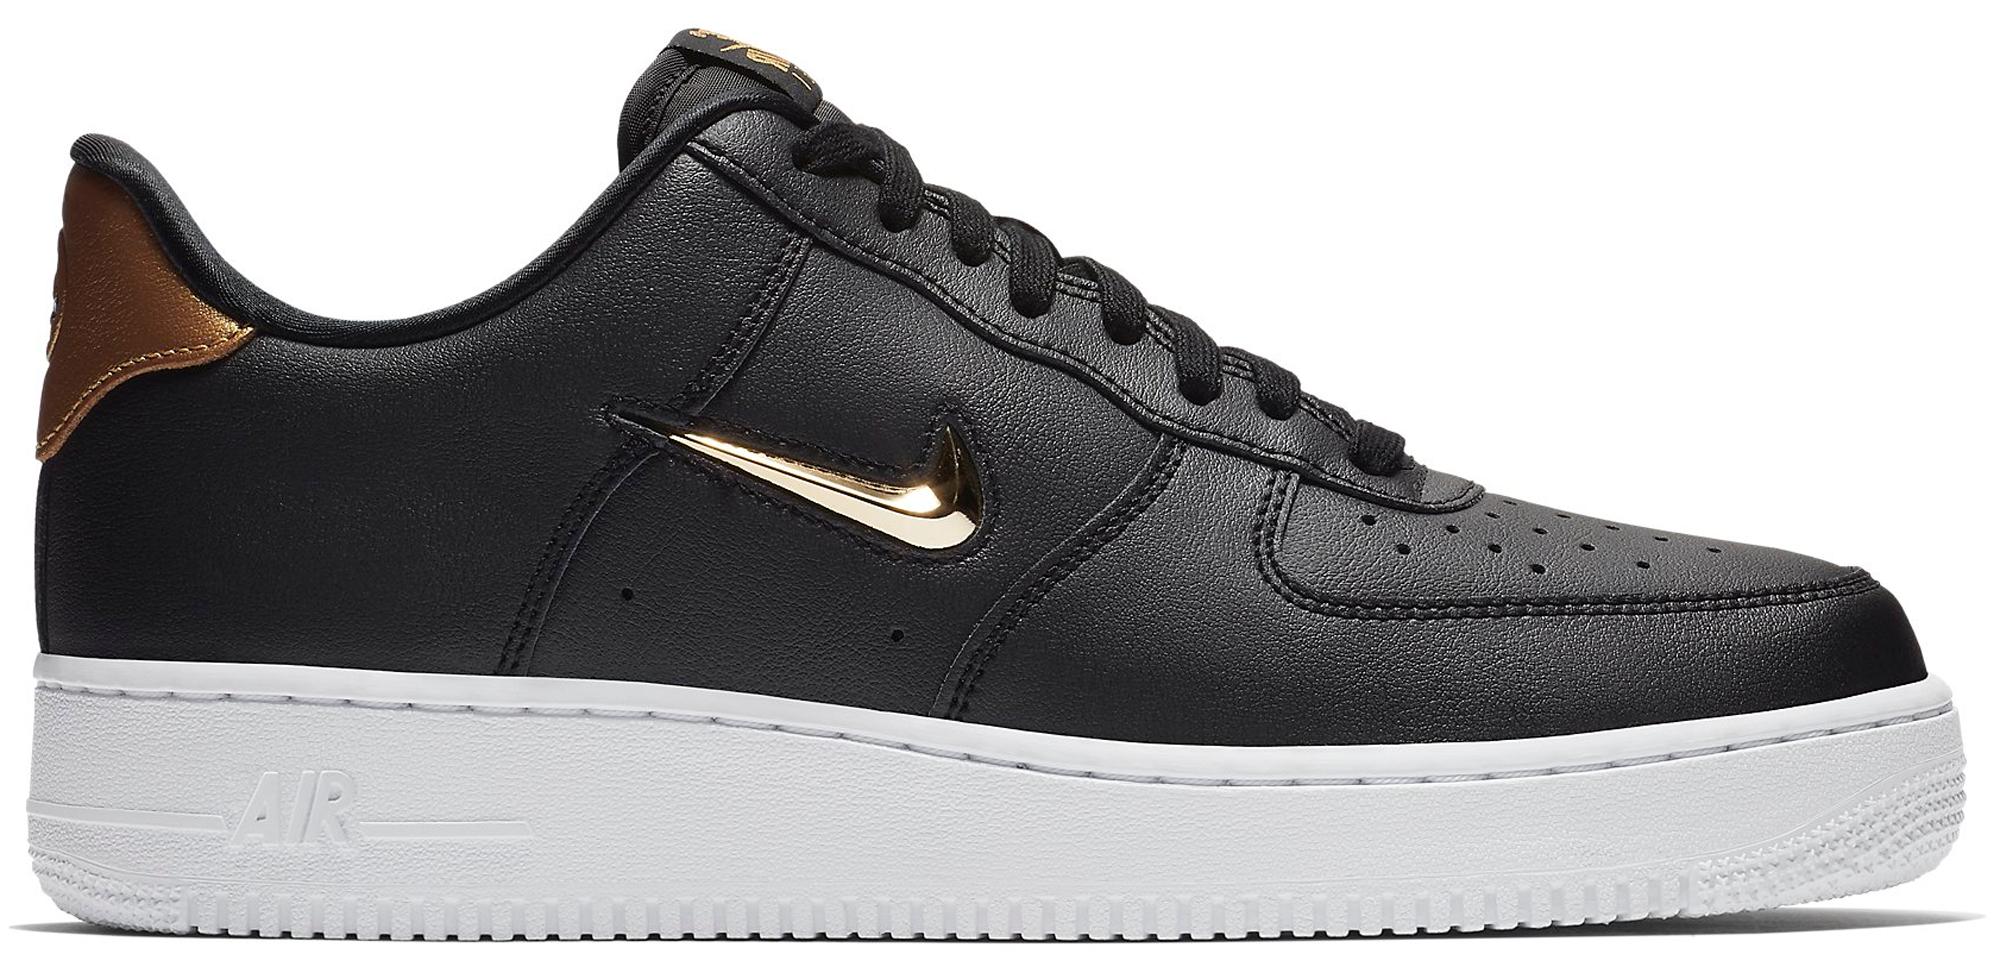 Nike Air Force 1 Low Jewel Black